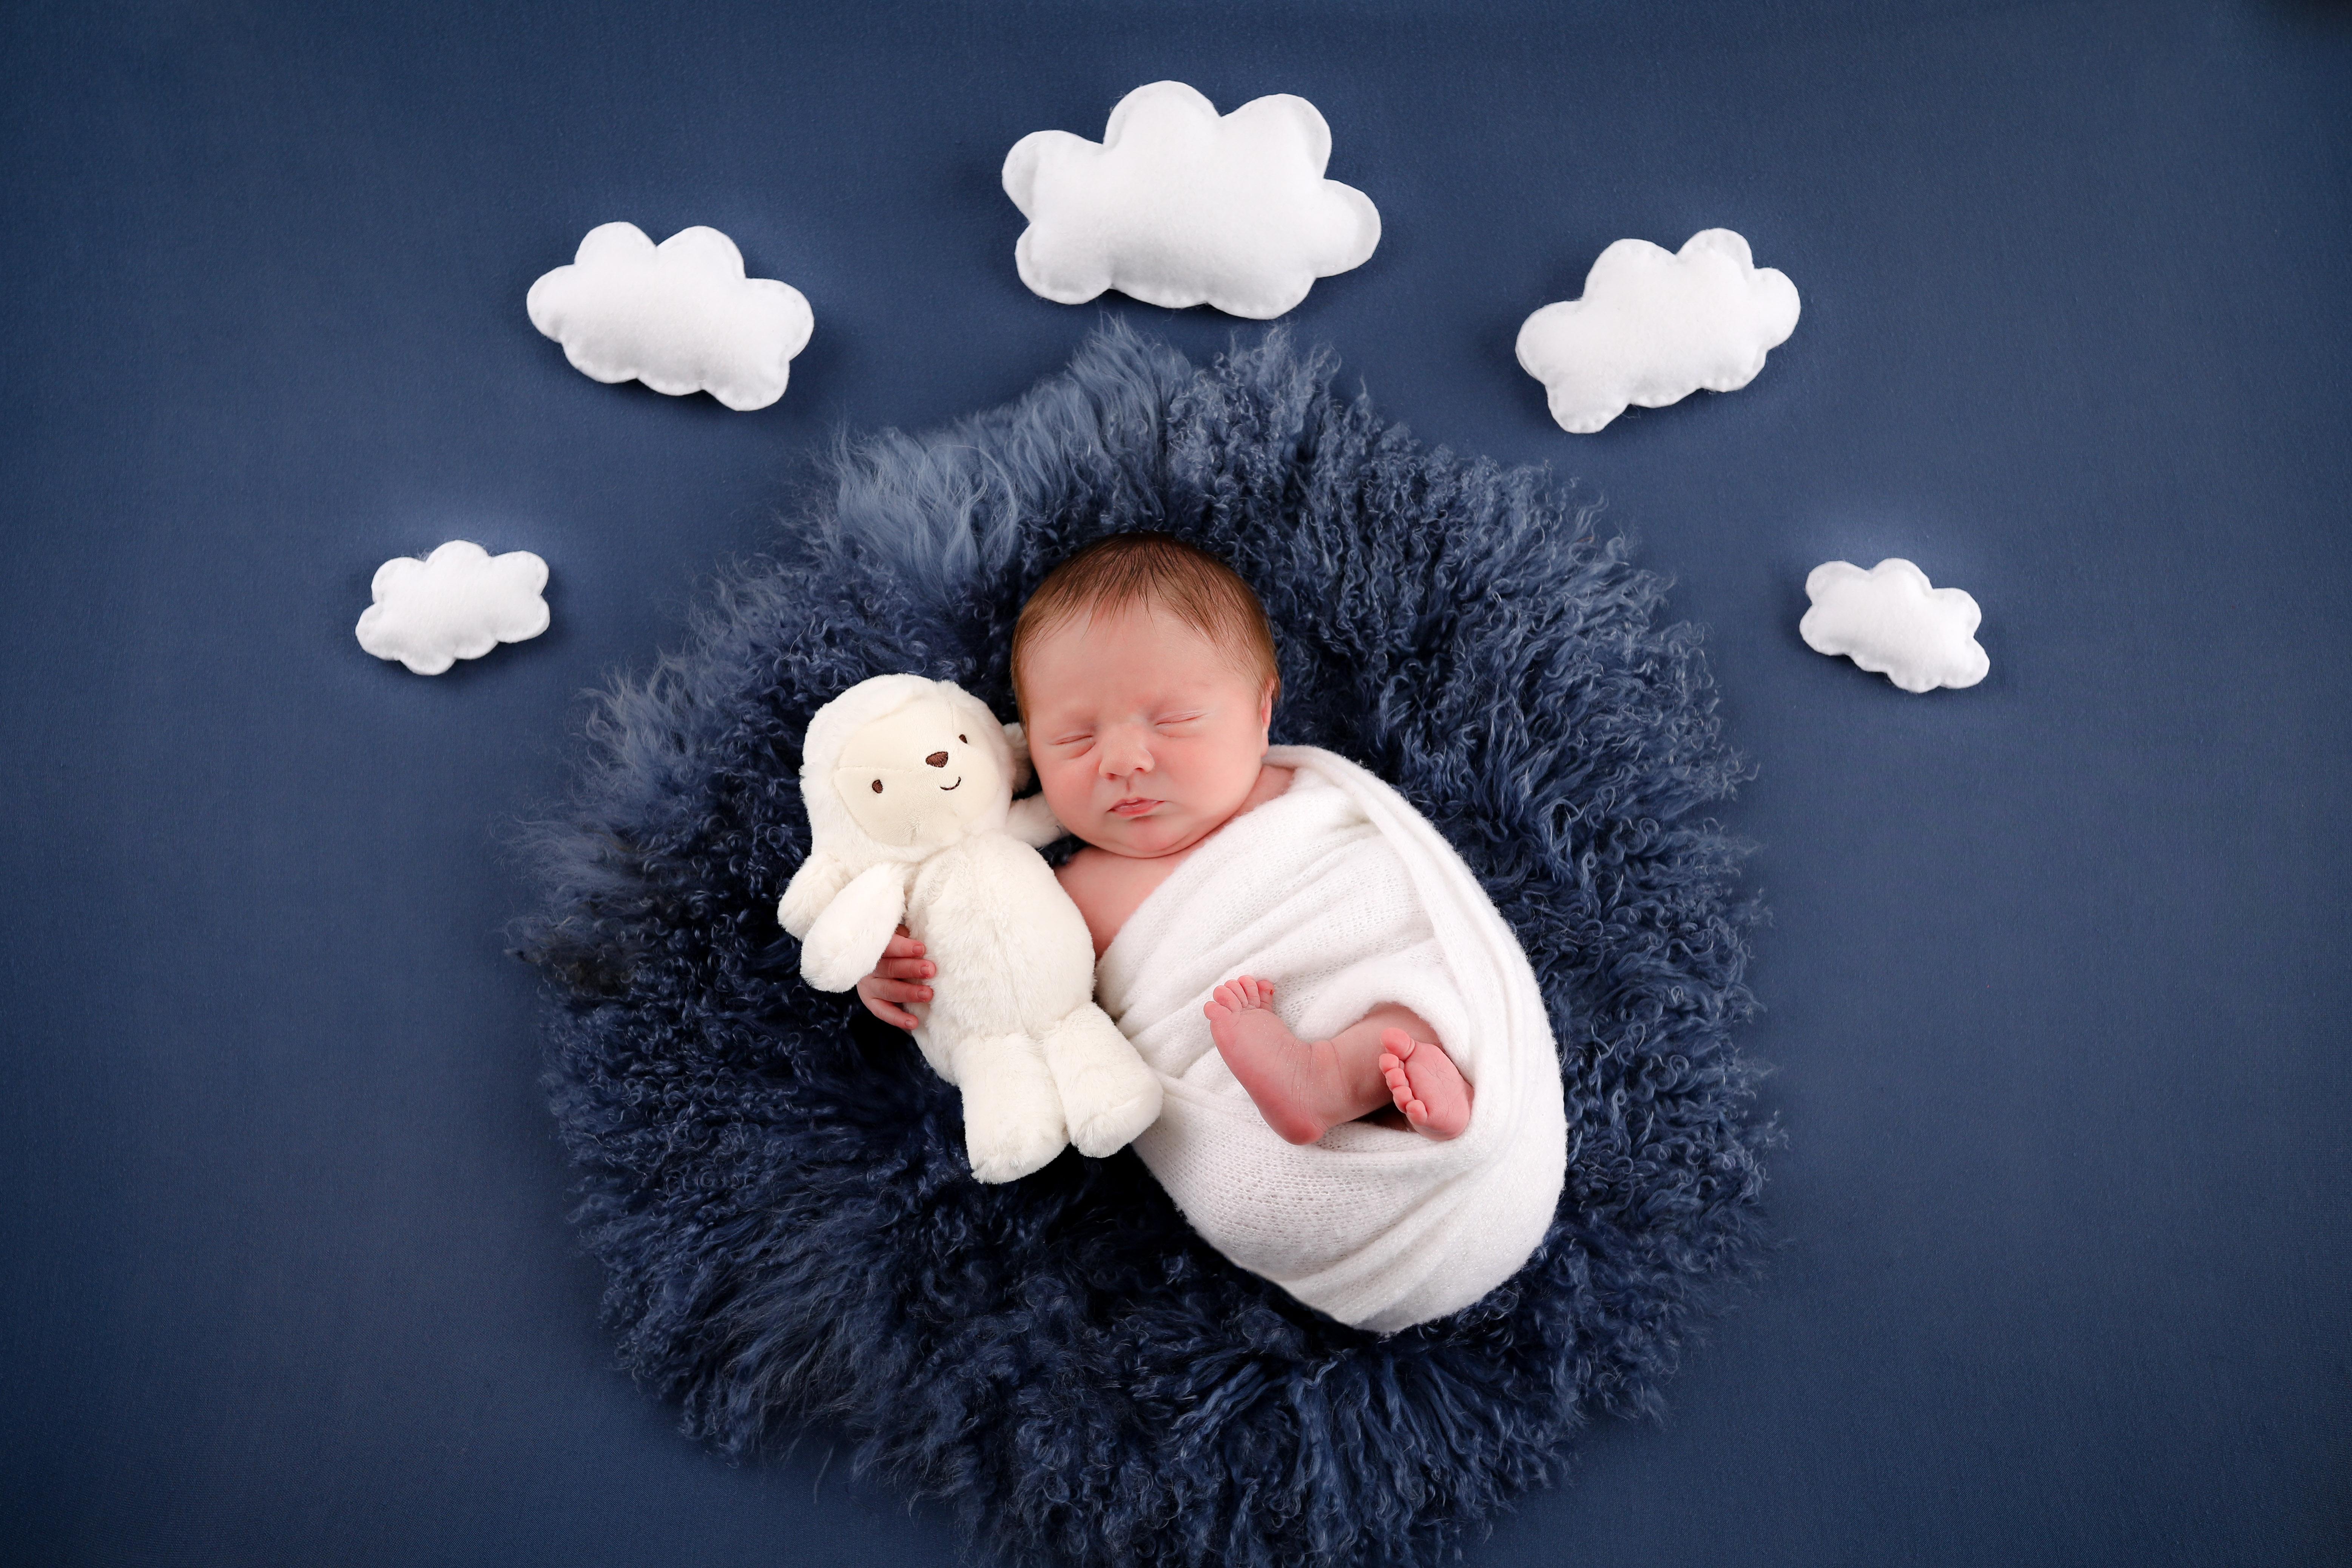 becci-hethcoat-photography-newborn-photographer-wheaton-30